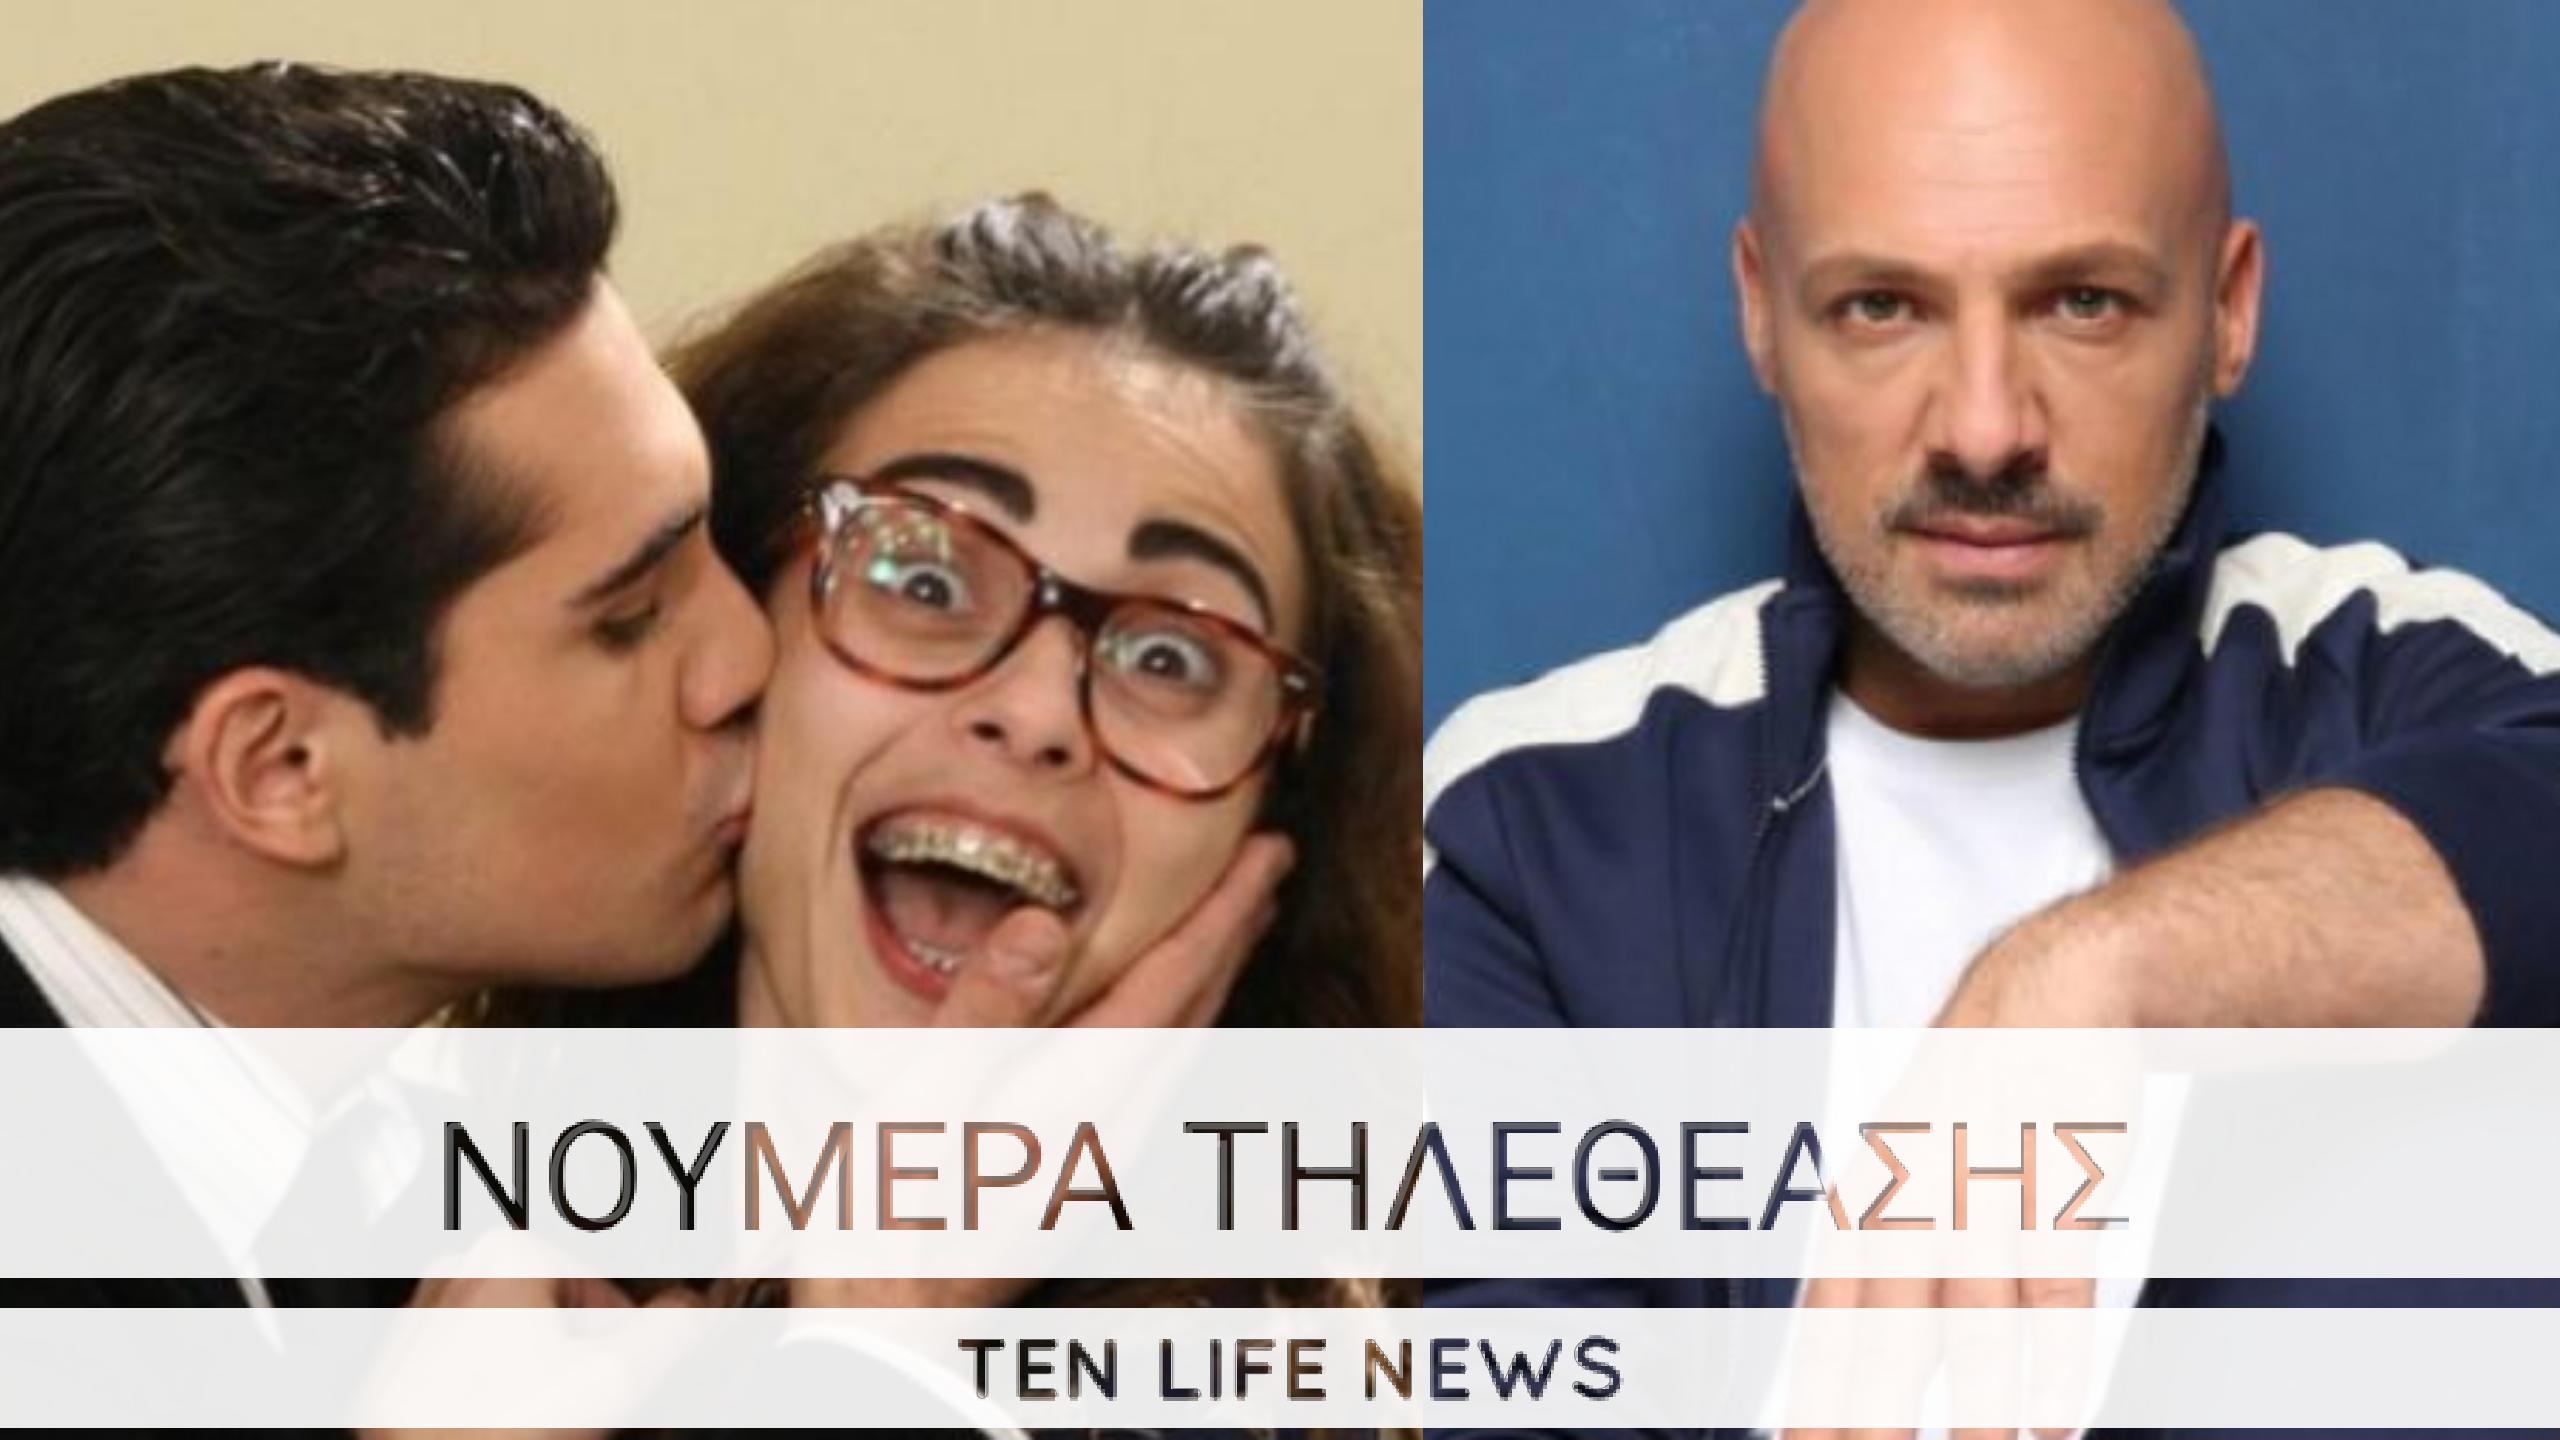 AGB: Επαθε σόκ με τα σημερινά νούμερα ο Νίκος Μουτσινάς τον έφαγε η Μαρία…